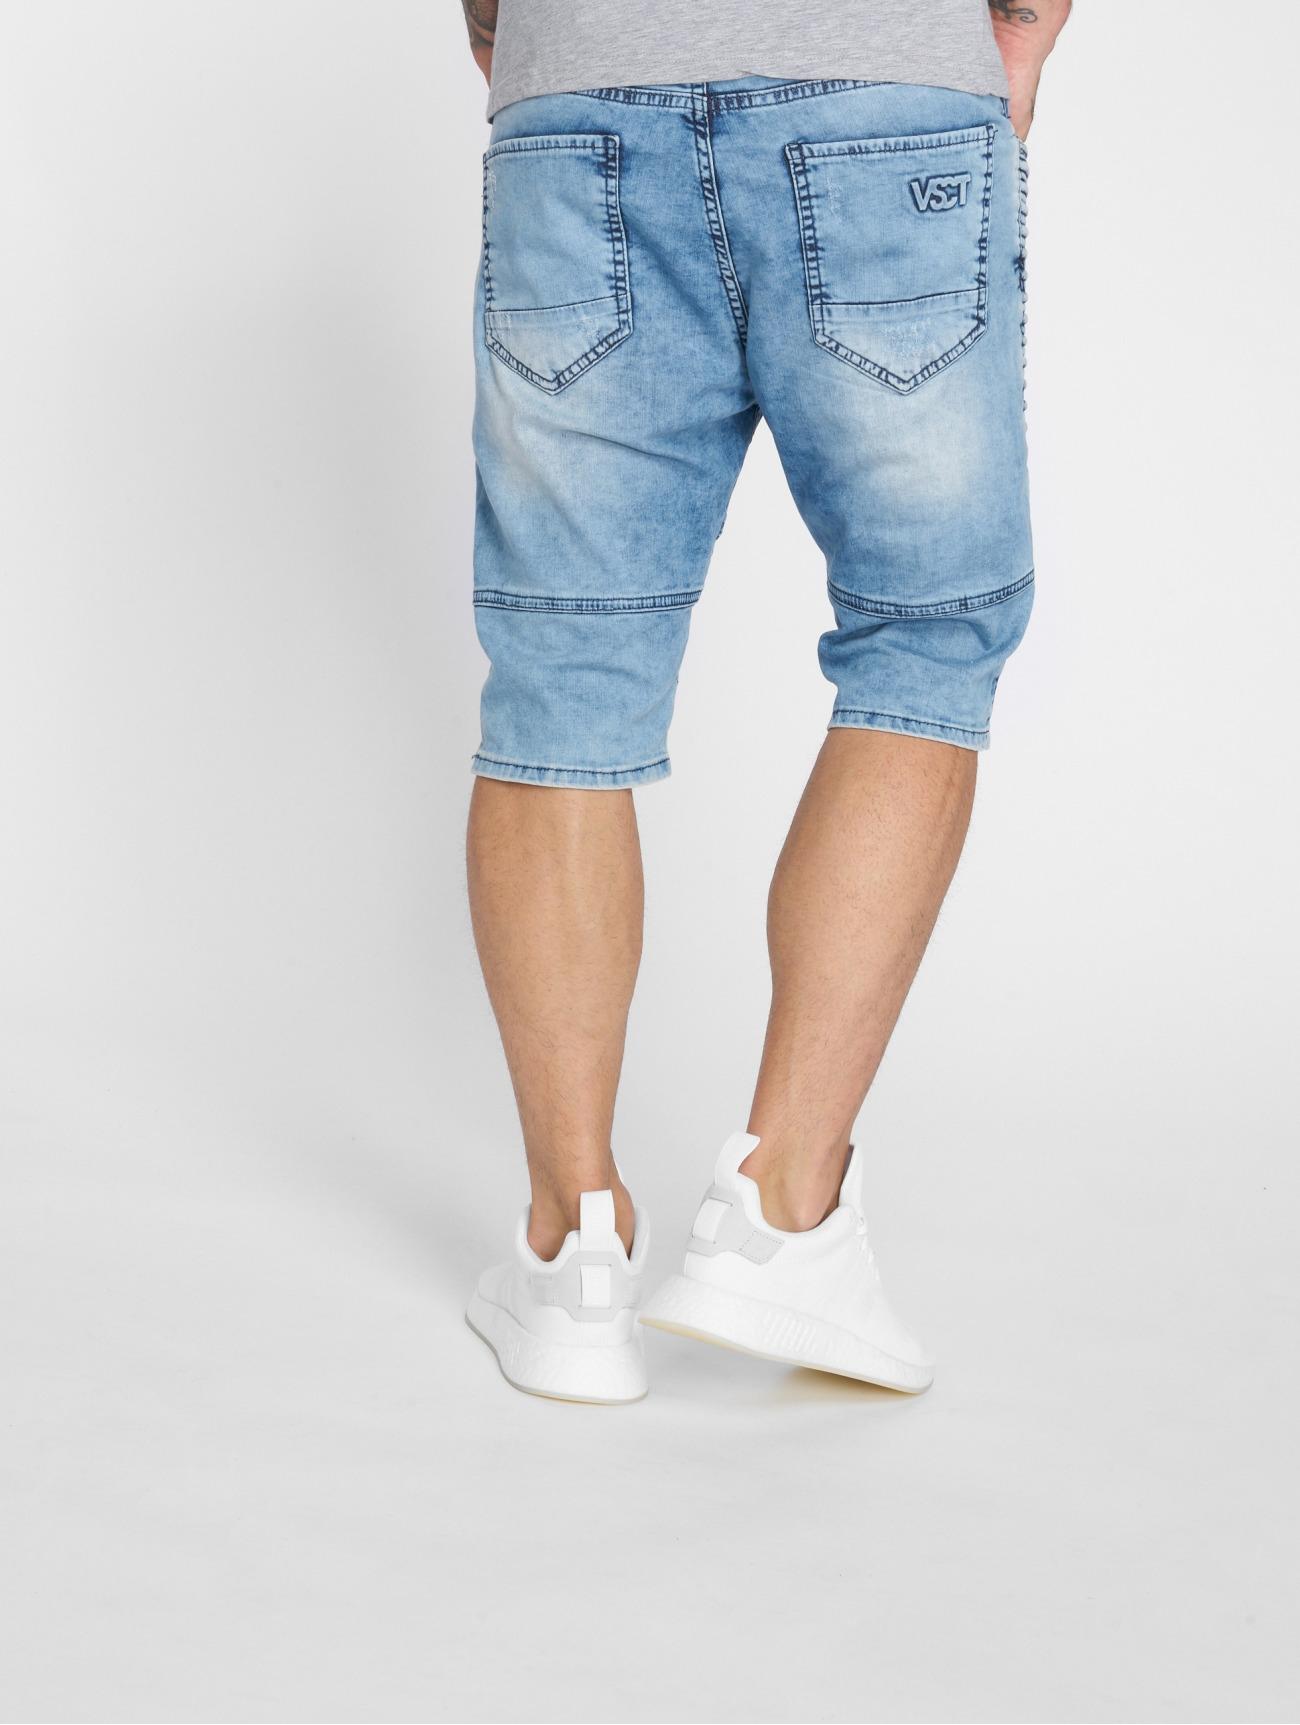 VSCT Clubwear  Liam  bleu Homme Short  531881 Homme Pantalons & Shorts